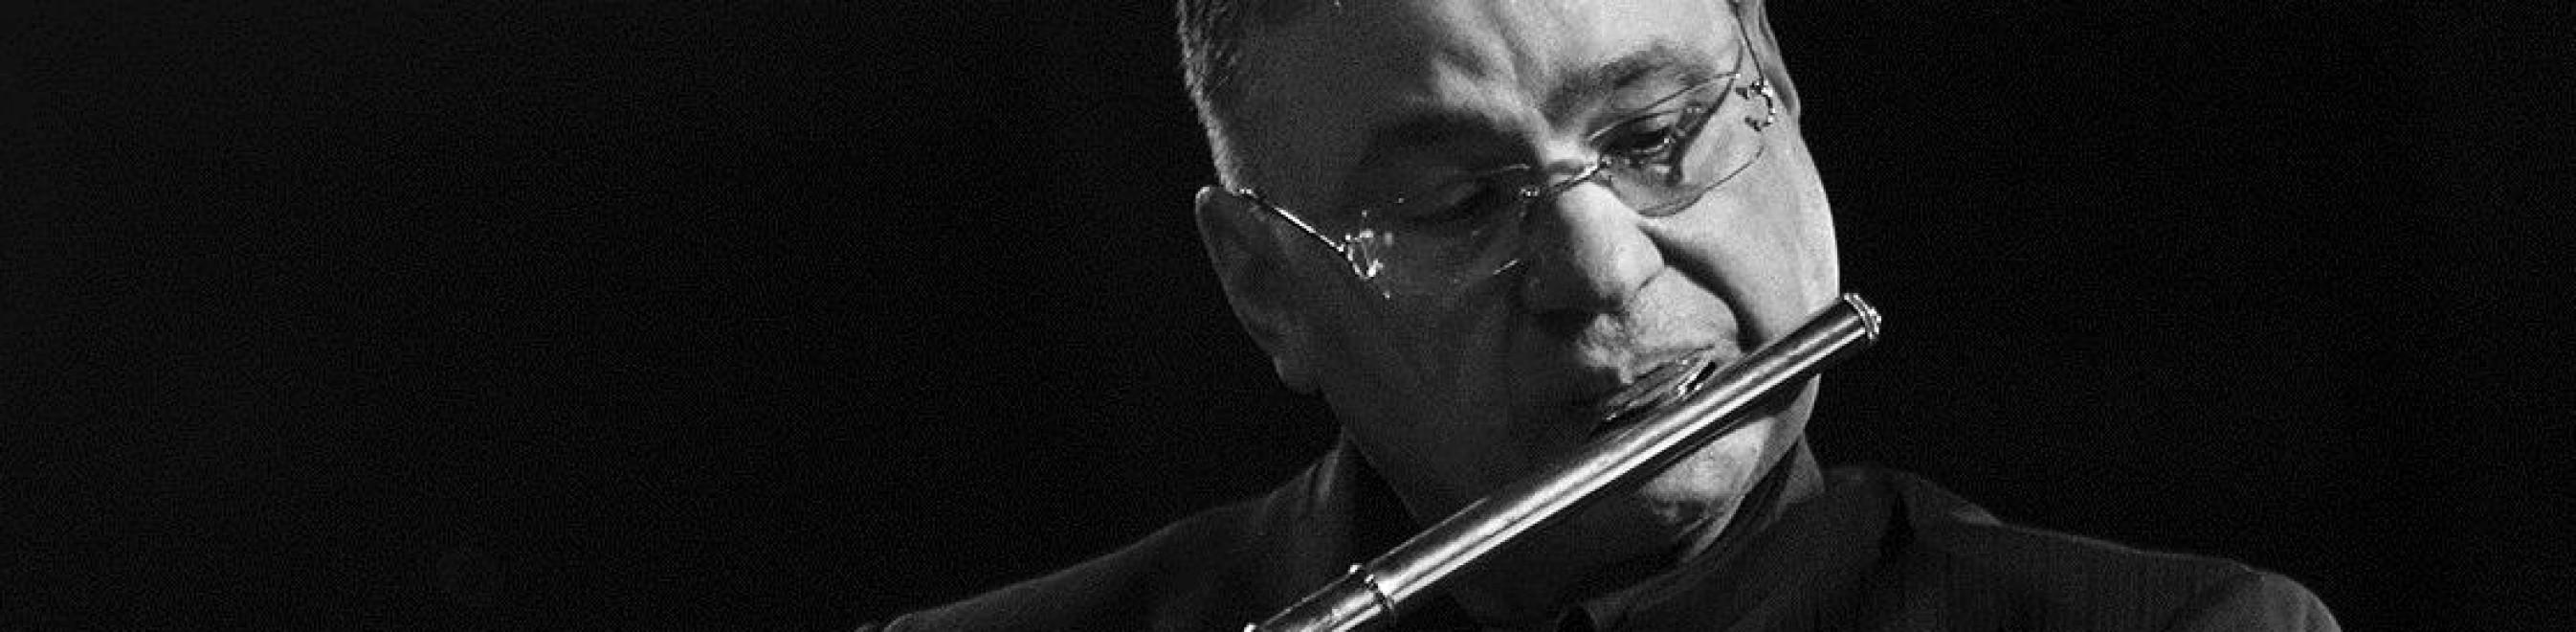 CARBOTTA flauto HOSSEN violino BALZARETTI pianoforte